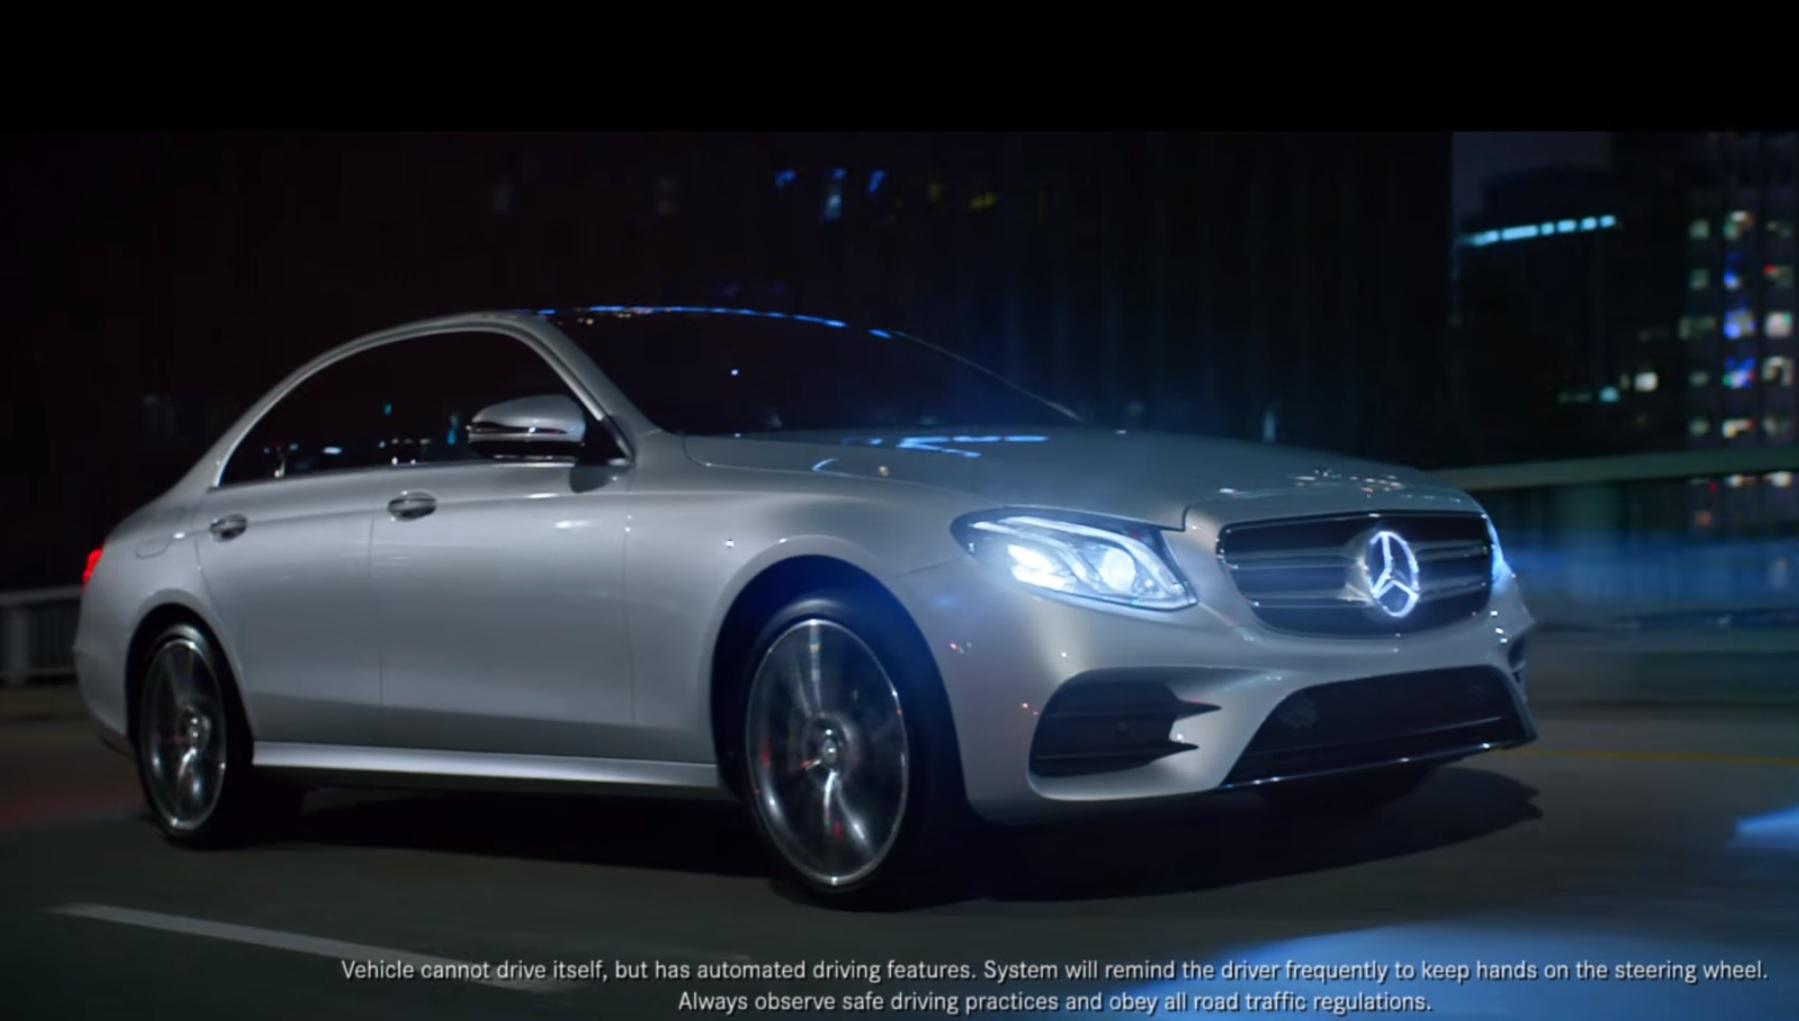 Mercedes-Benz E-Class Commercial